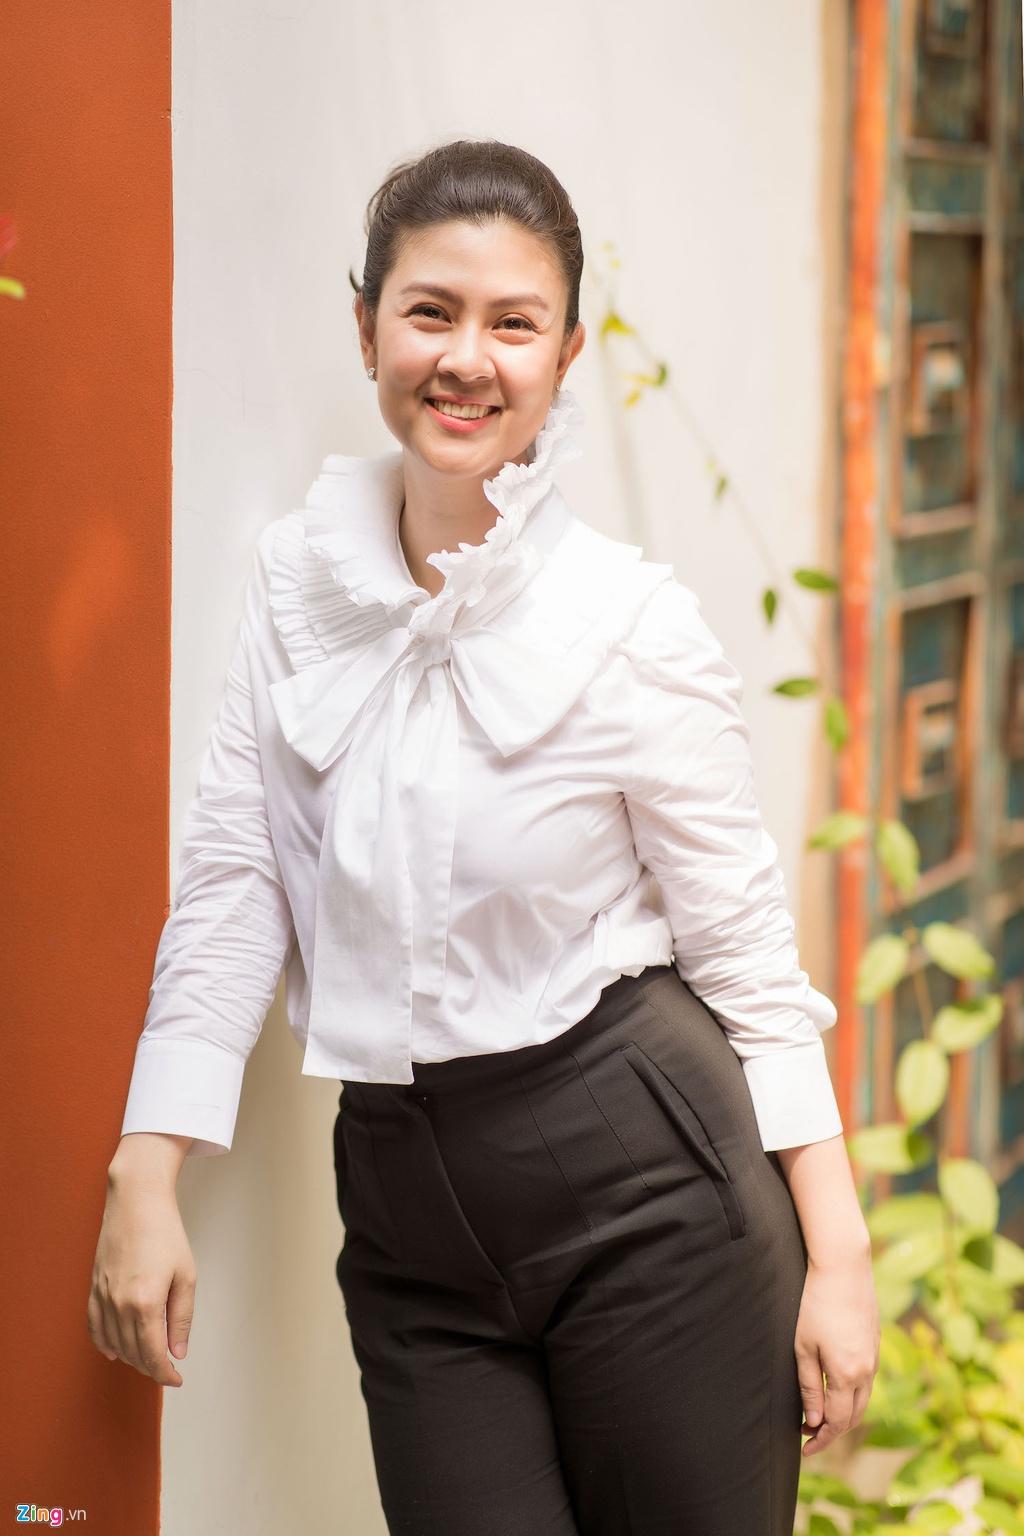 Kim Thu:'7 nam, toi khong mua duoc mot cai tui' hinh anh 4 NGT_zing-1103.jpg